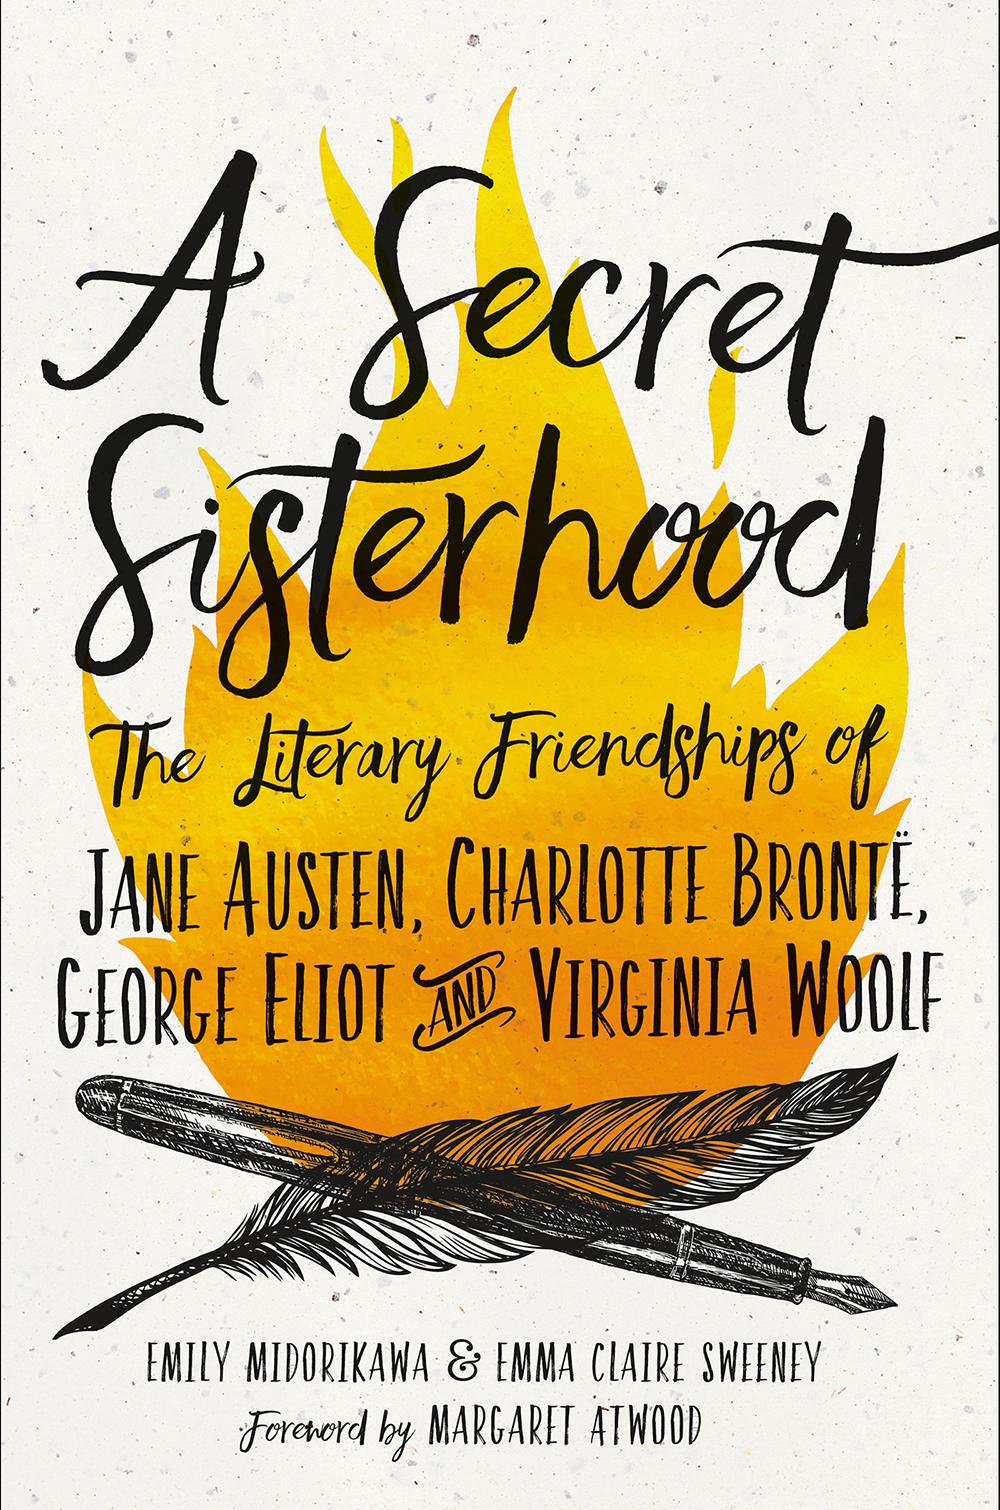 A Secret Sisterhood: The Literary Friendships of Jane Austen, Charlotte Brontë, George Eliot, and Virginia Woolf, by Emily Midorikawa and Emma Claire Sweeney. Houghton Mifflin Harcourt.